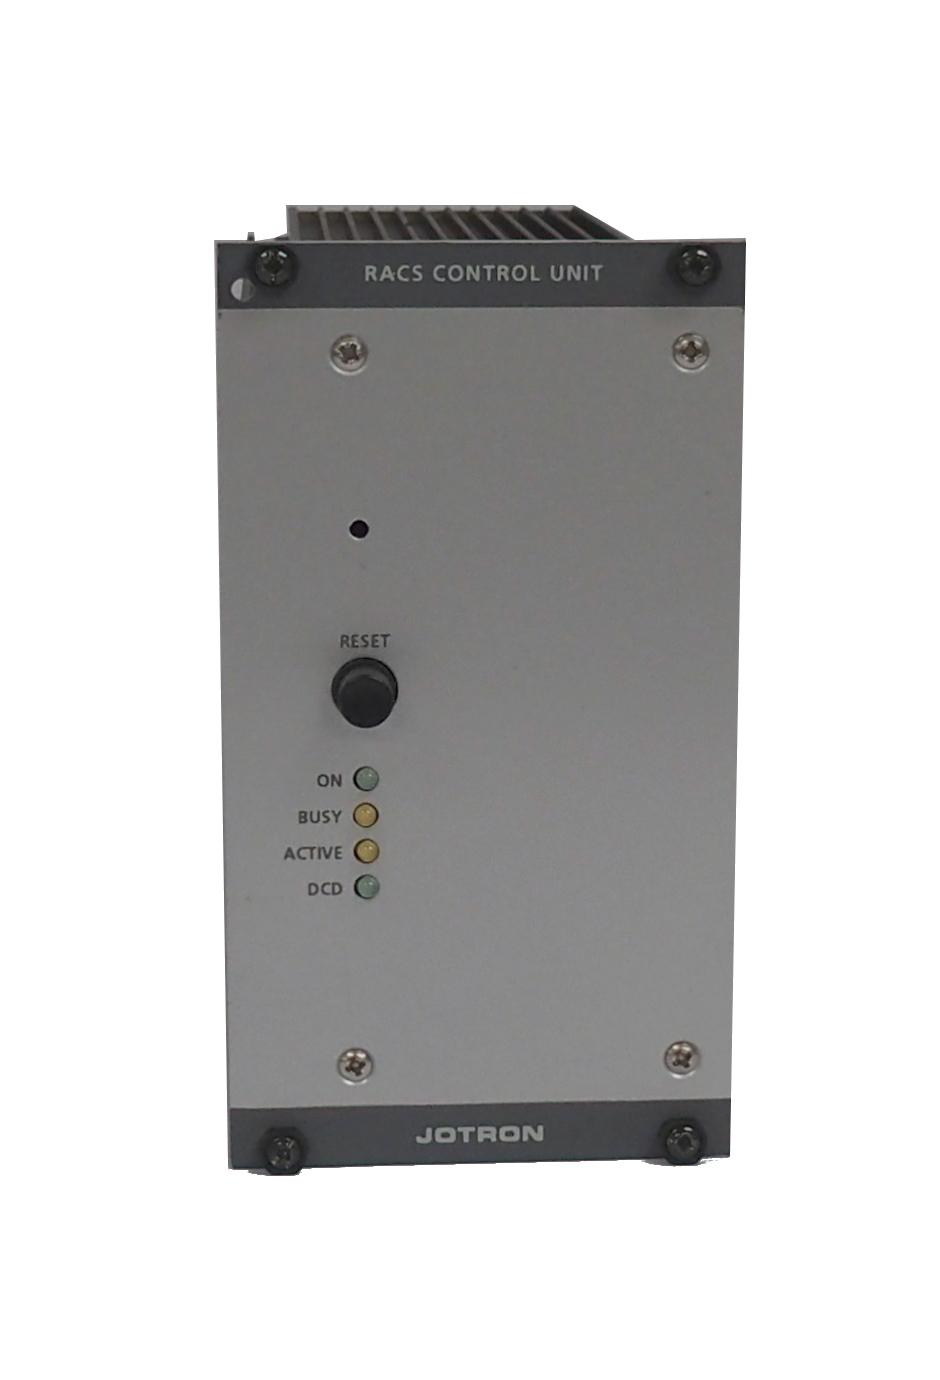 Jotron RACS Control Unit - Remote Access And Control Software Unit